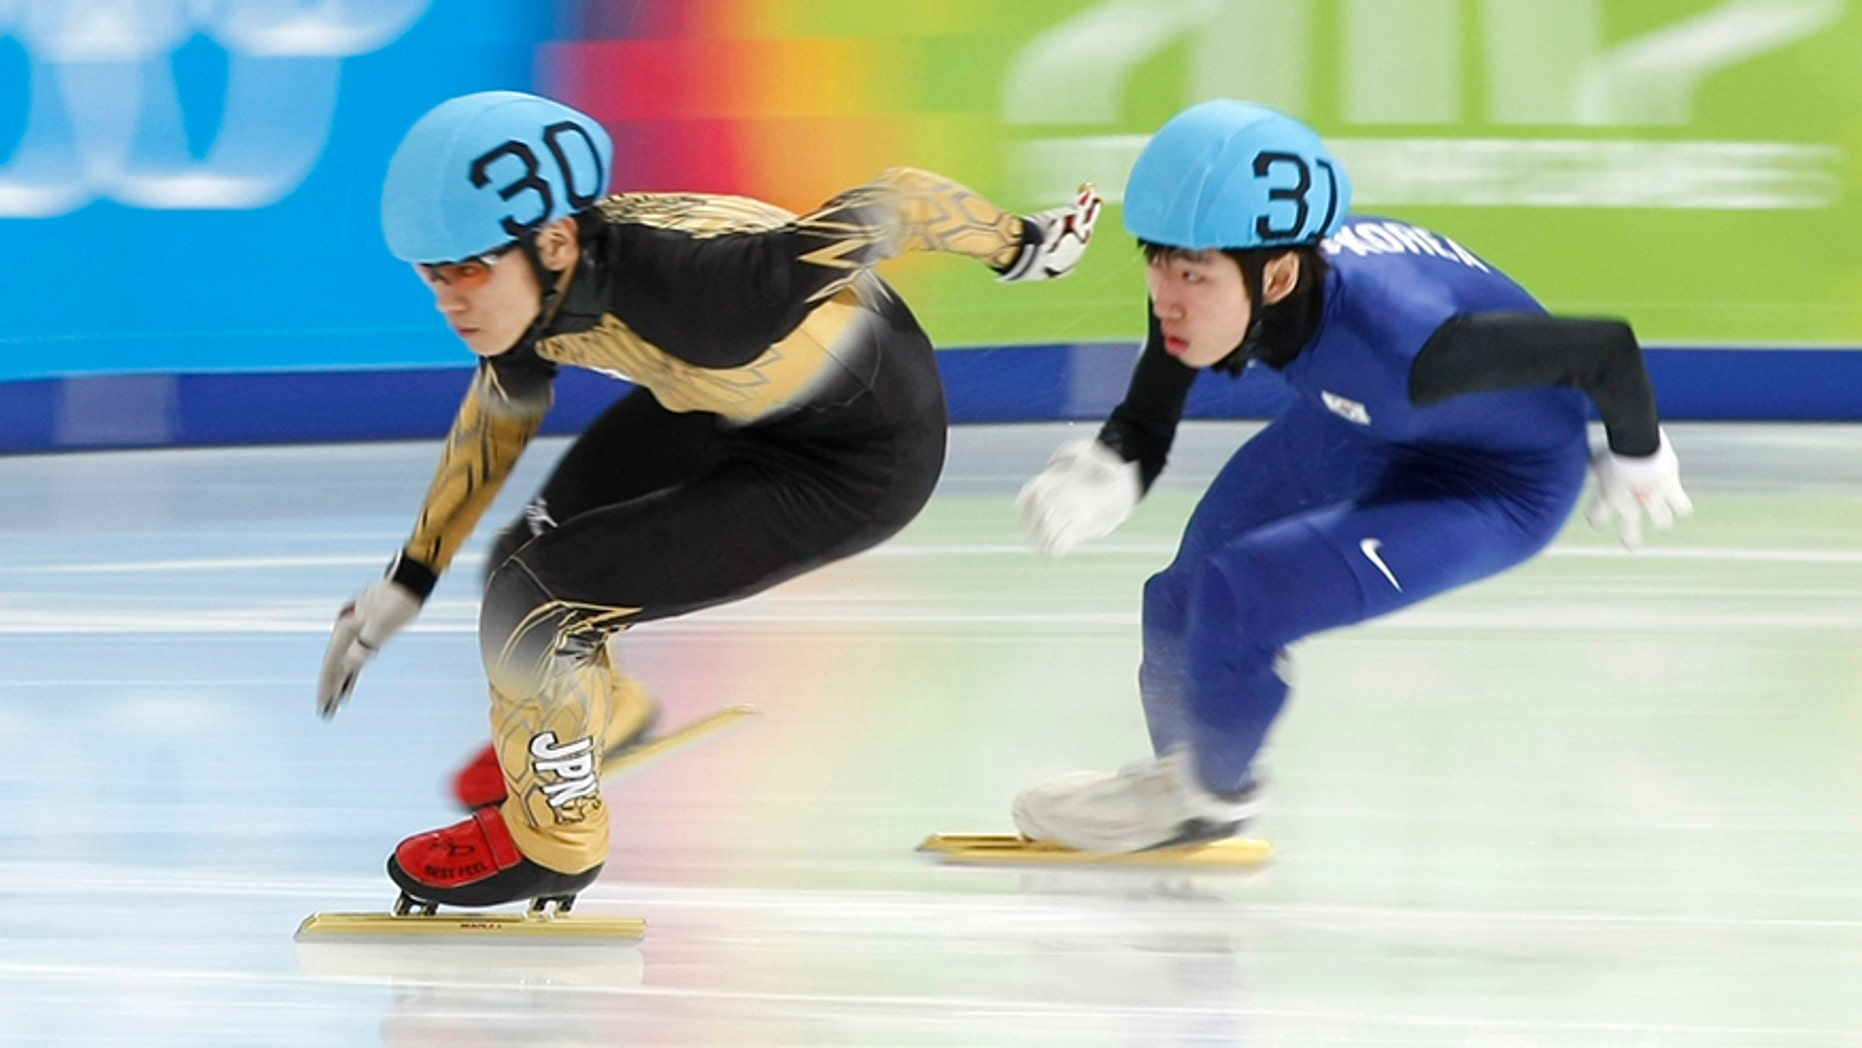 Jan. 19, 2012: Japan's Kei Saito, left, skates ahead of South Korea's Lim Hyo-Jun at the first winter Youth Olympic Games.